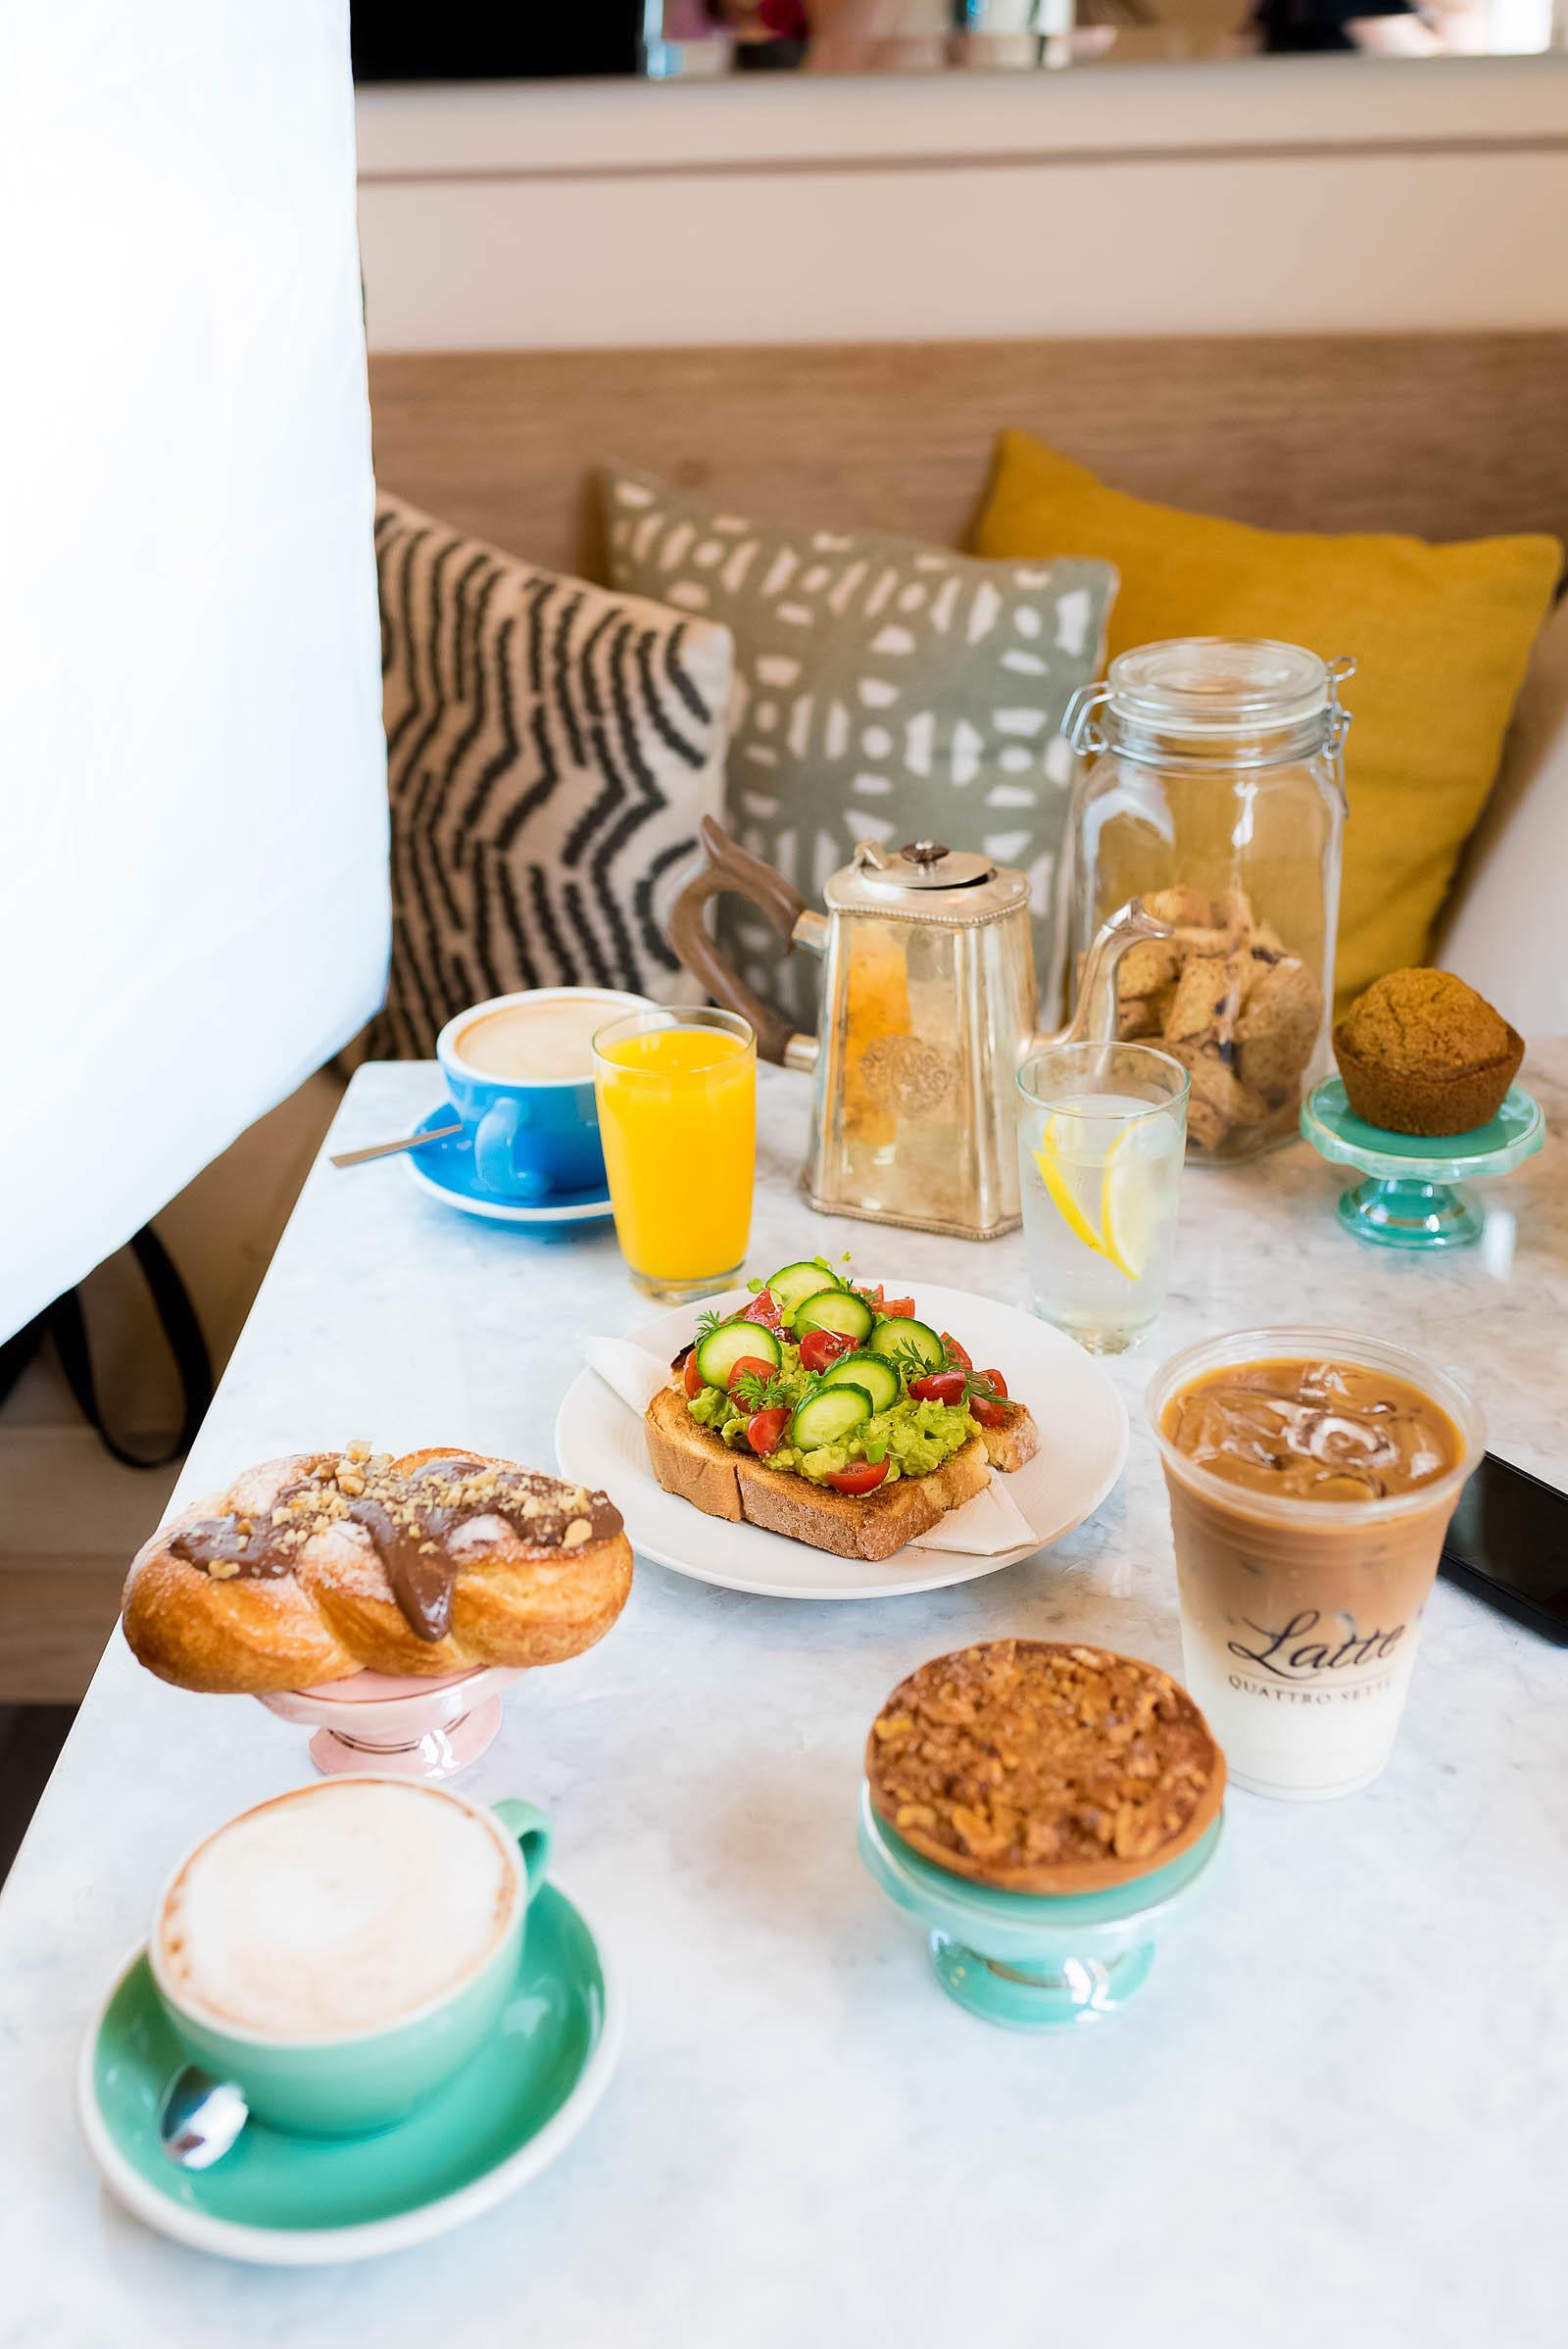 Latte Quattro Sette Coffee Shop Mérida Yucatán Mexico